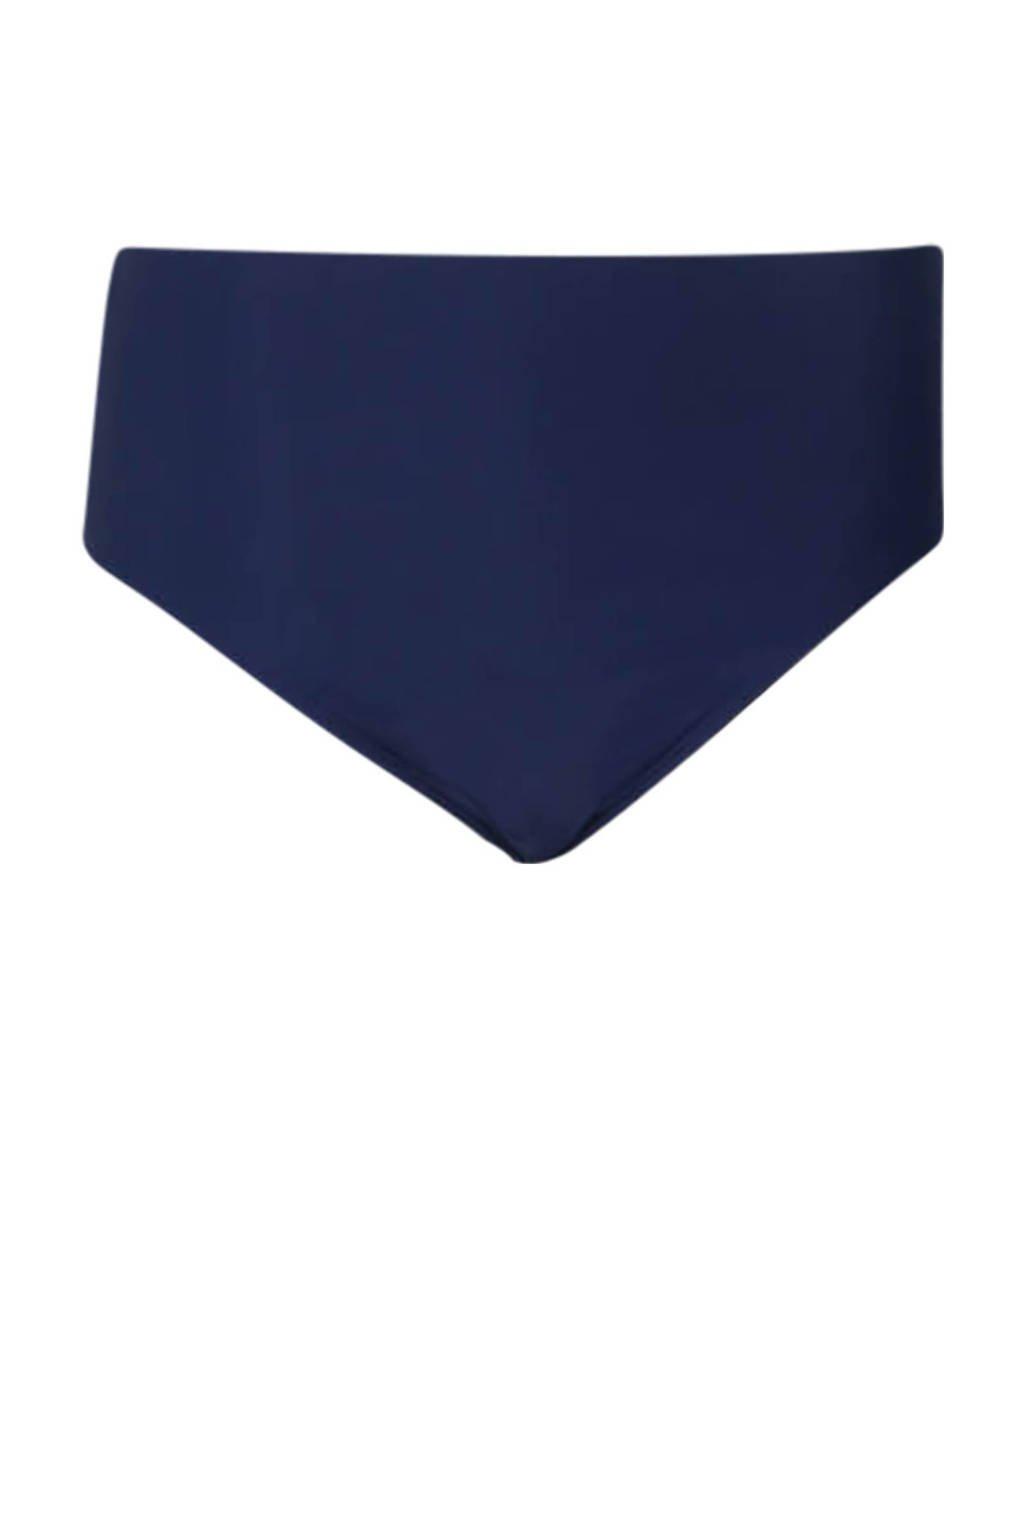 Paprika bikinibroekje donkerblauw, Donkerblauw